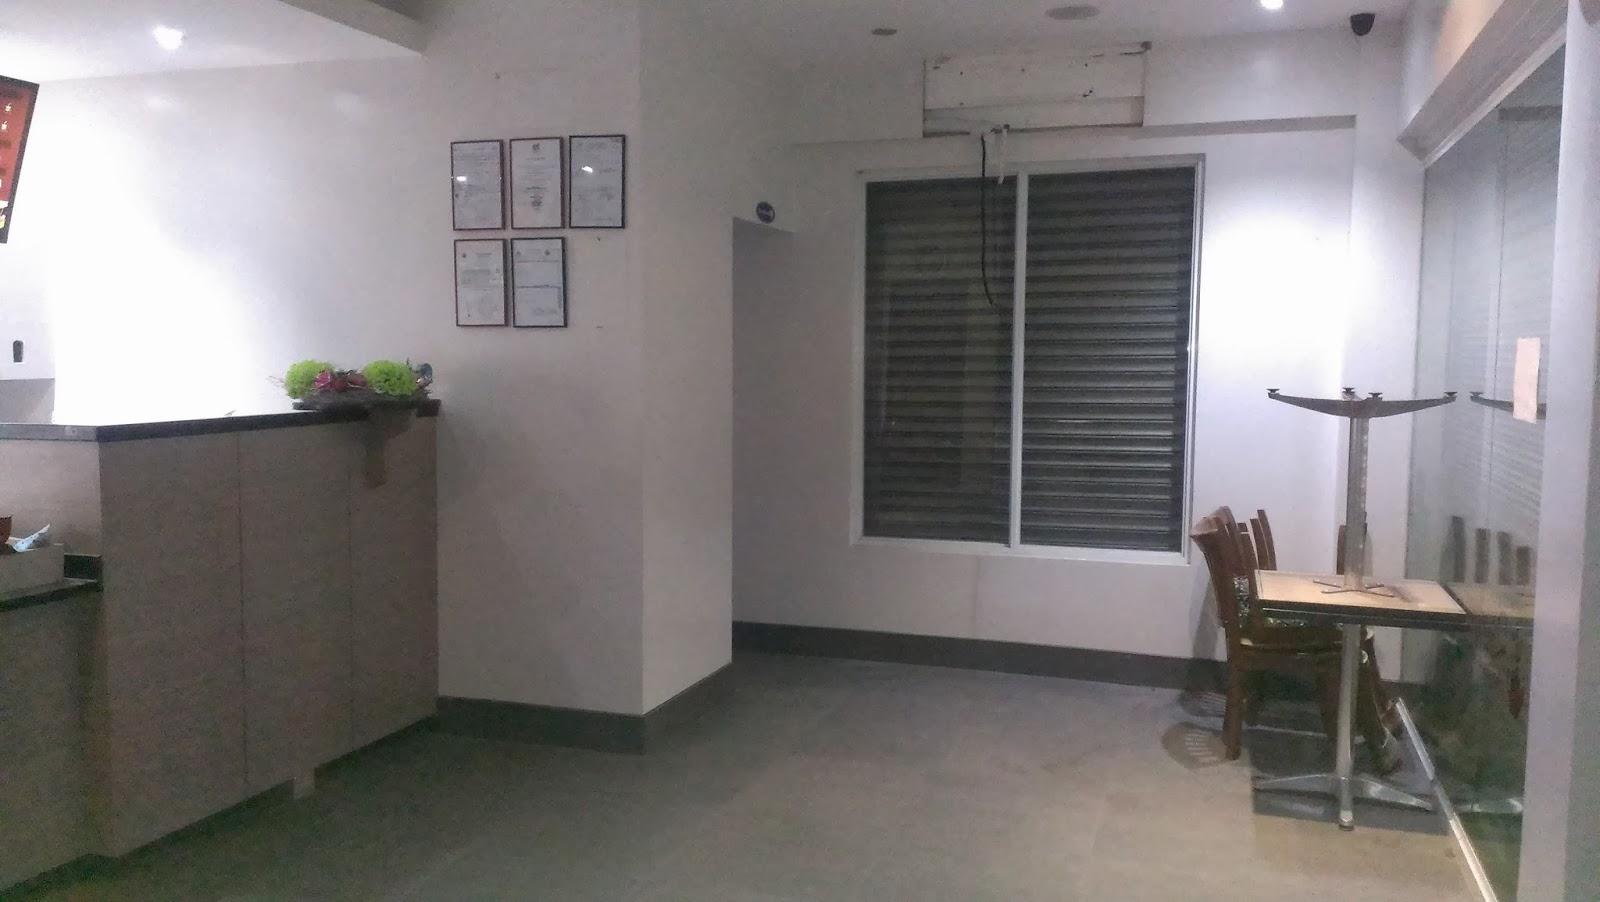 Small Spaces For Rent.Apartment Est Interior Design For Spaces ...